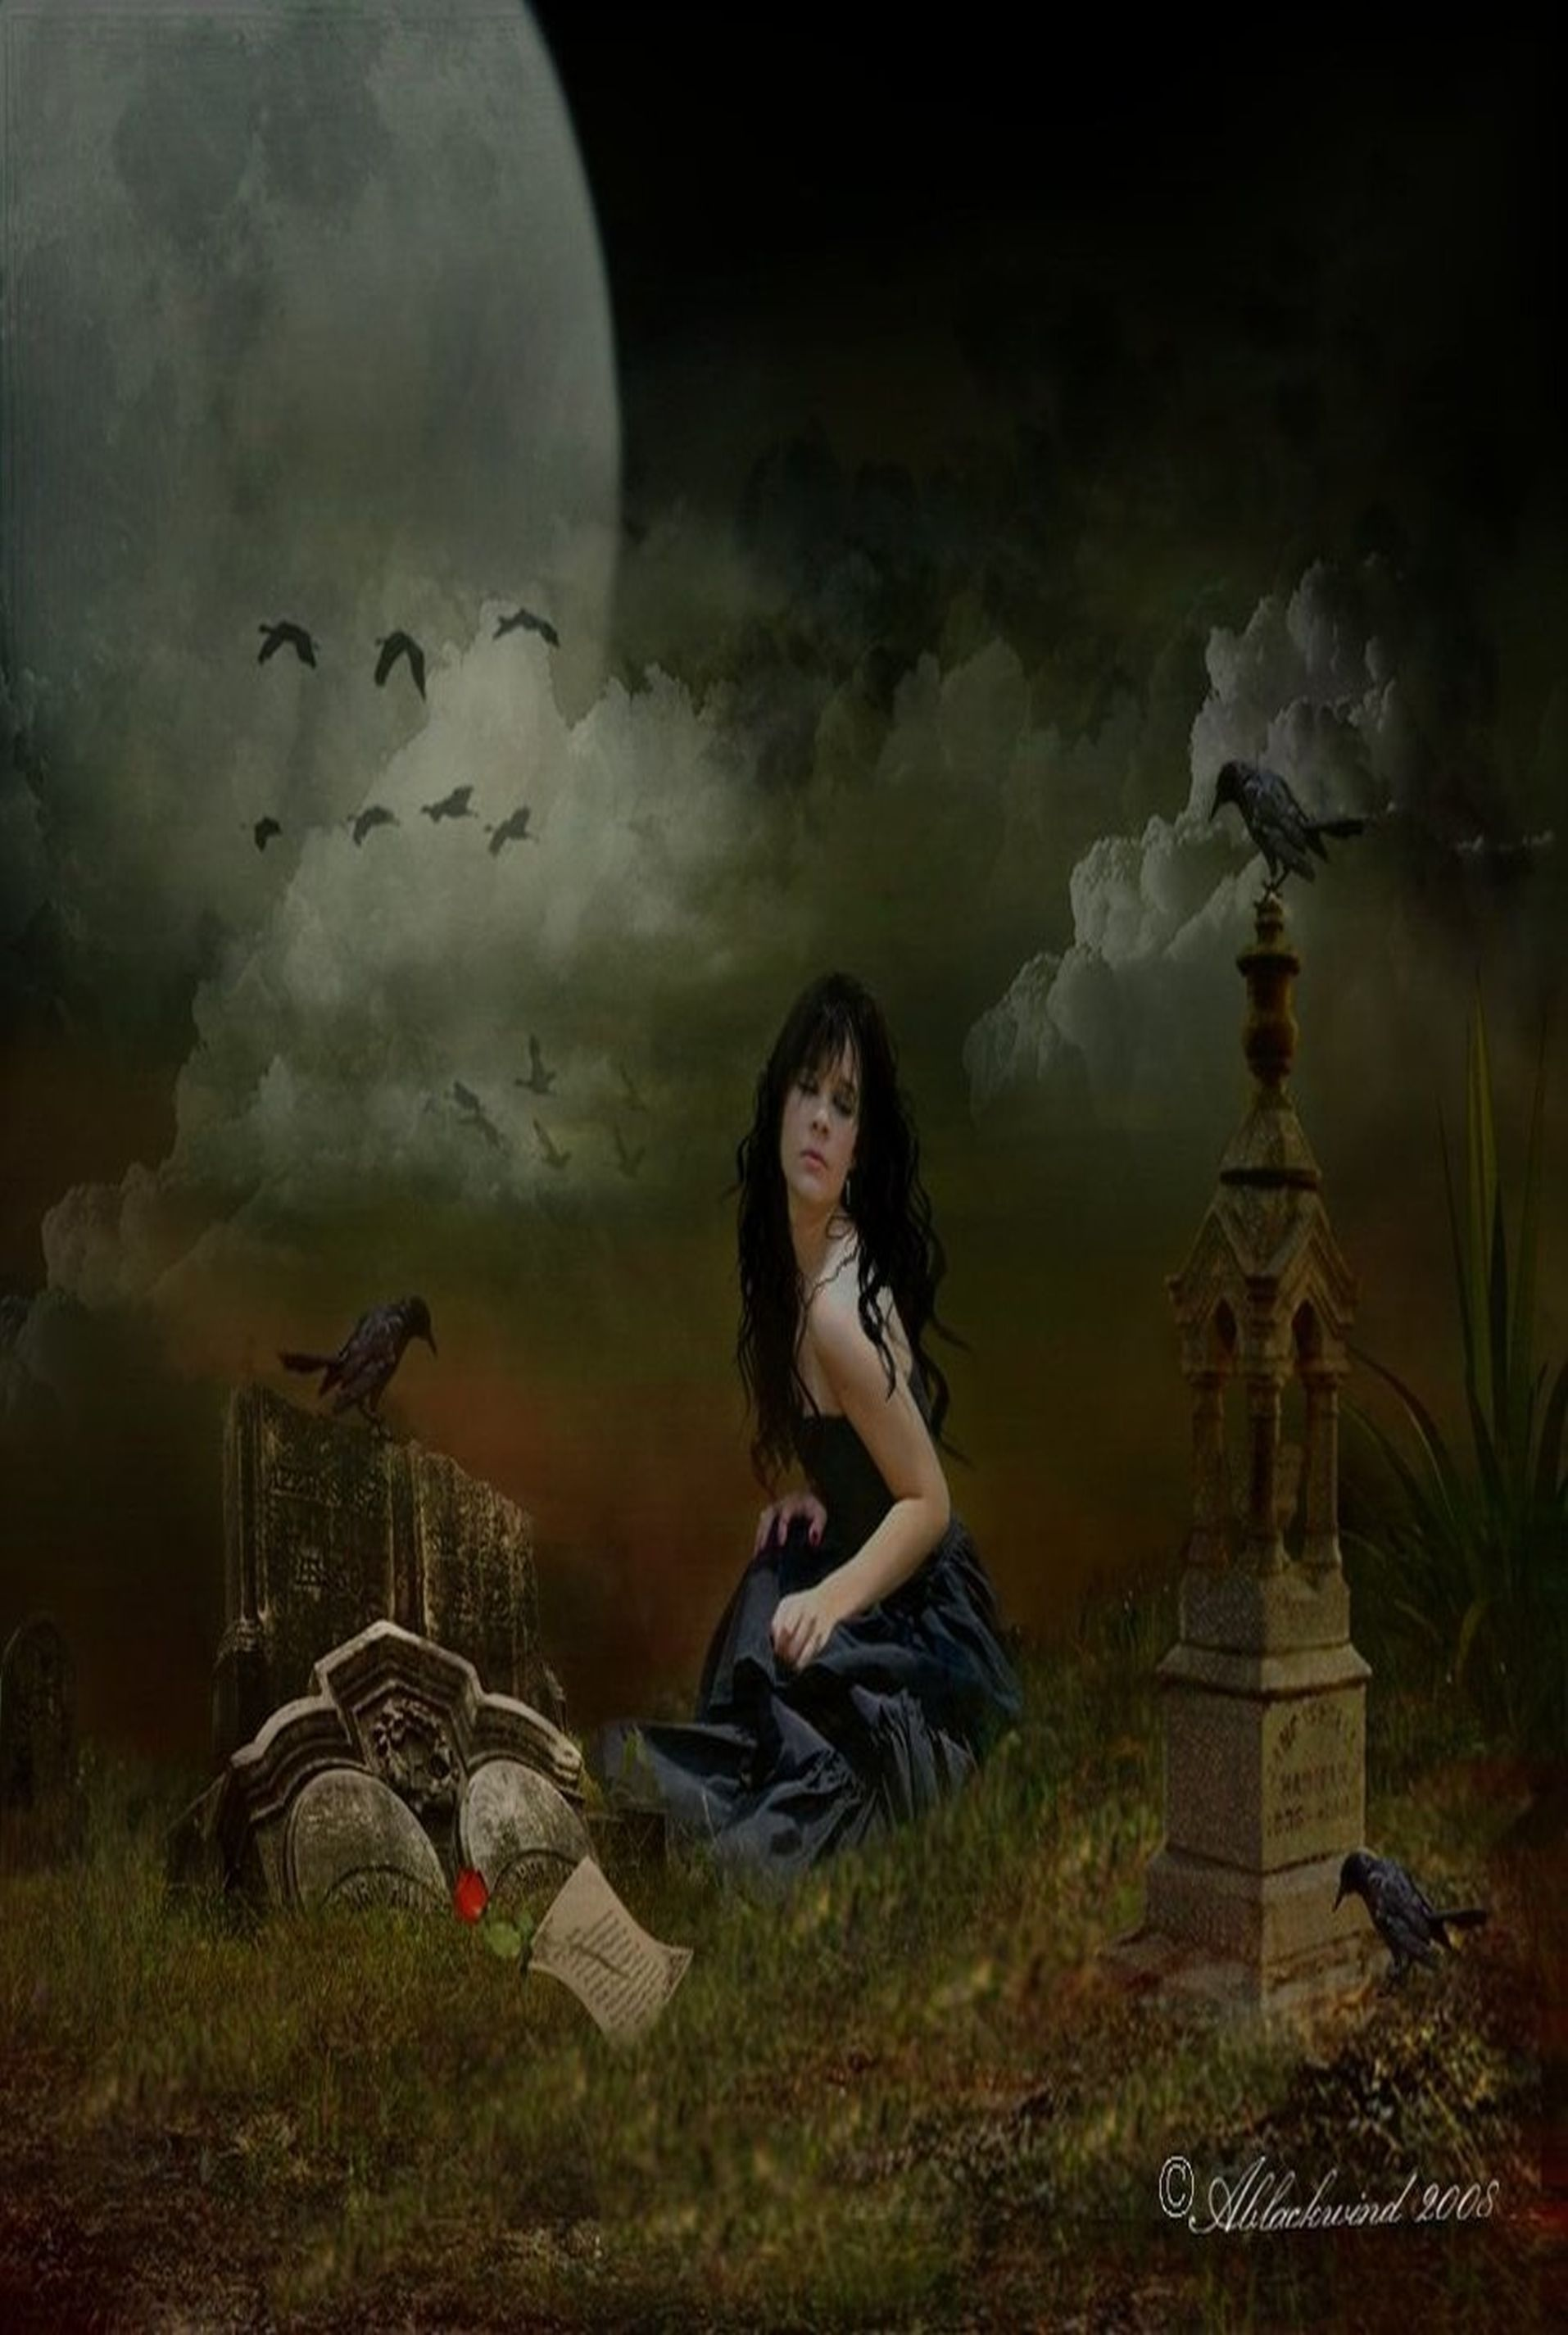 eBook - The Dark Goddess